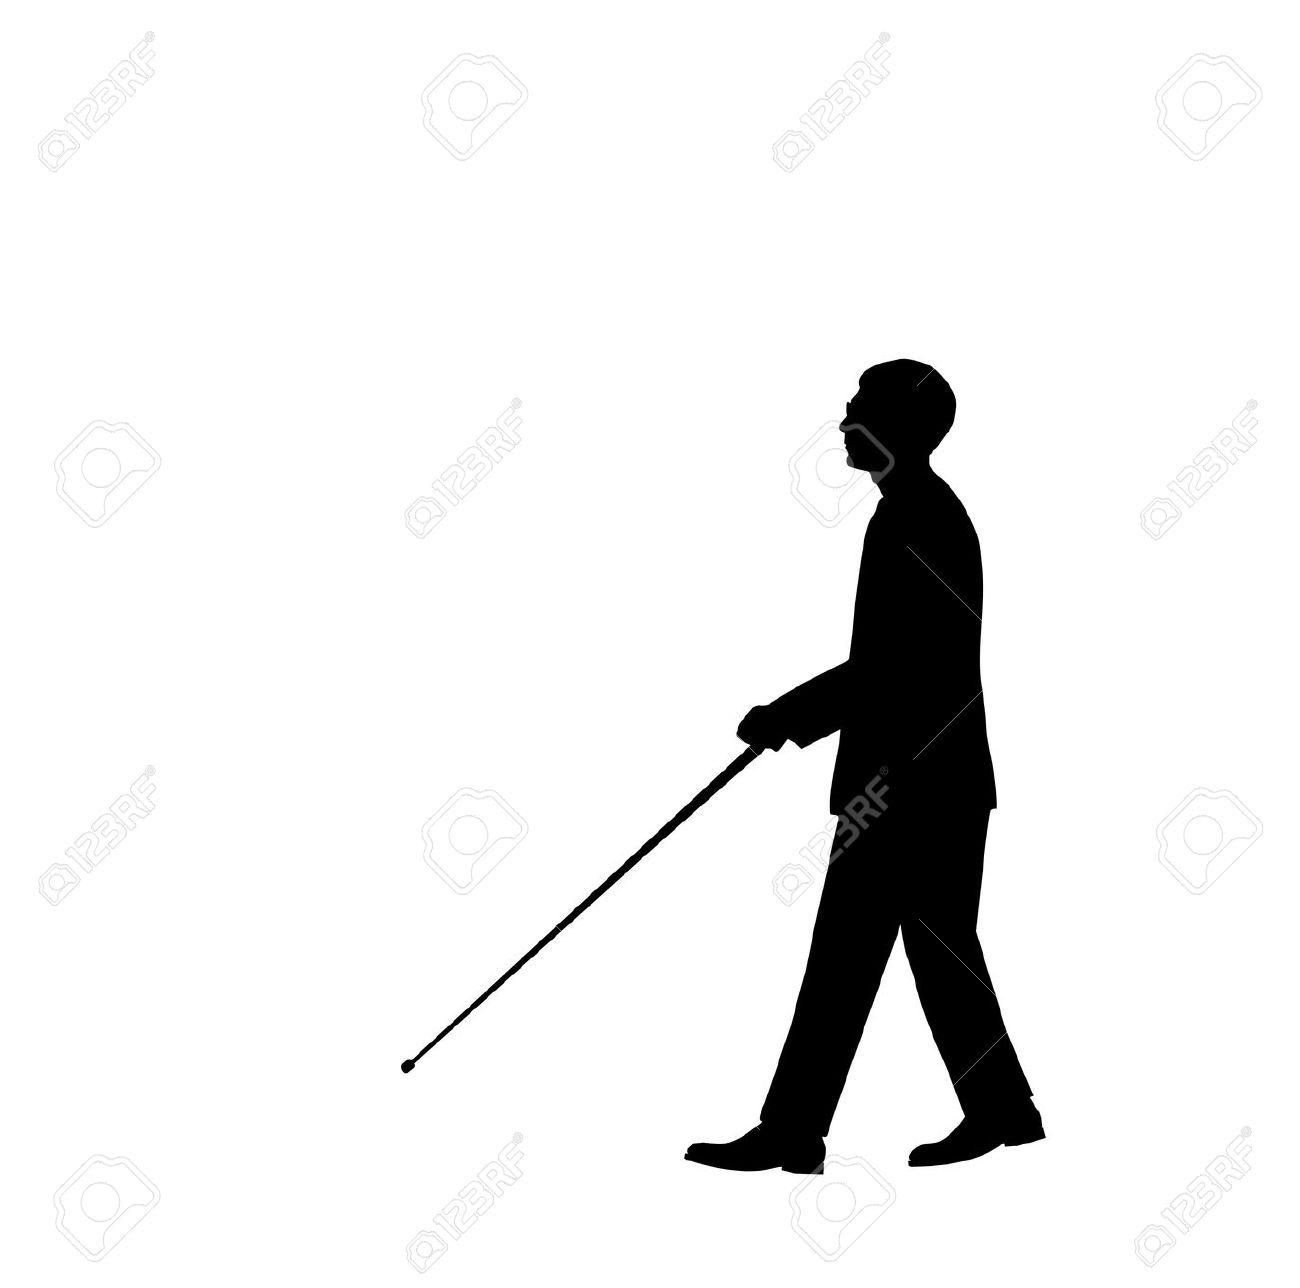 Blind Man Silhouette - 6851950